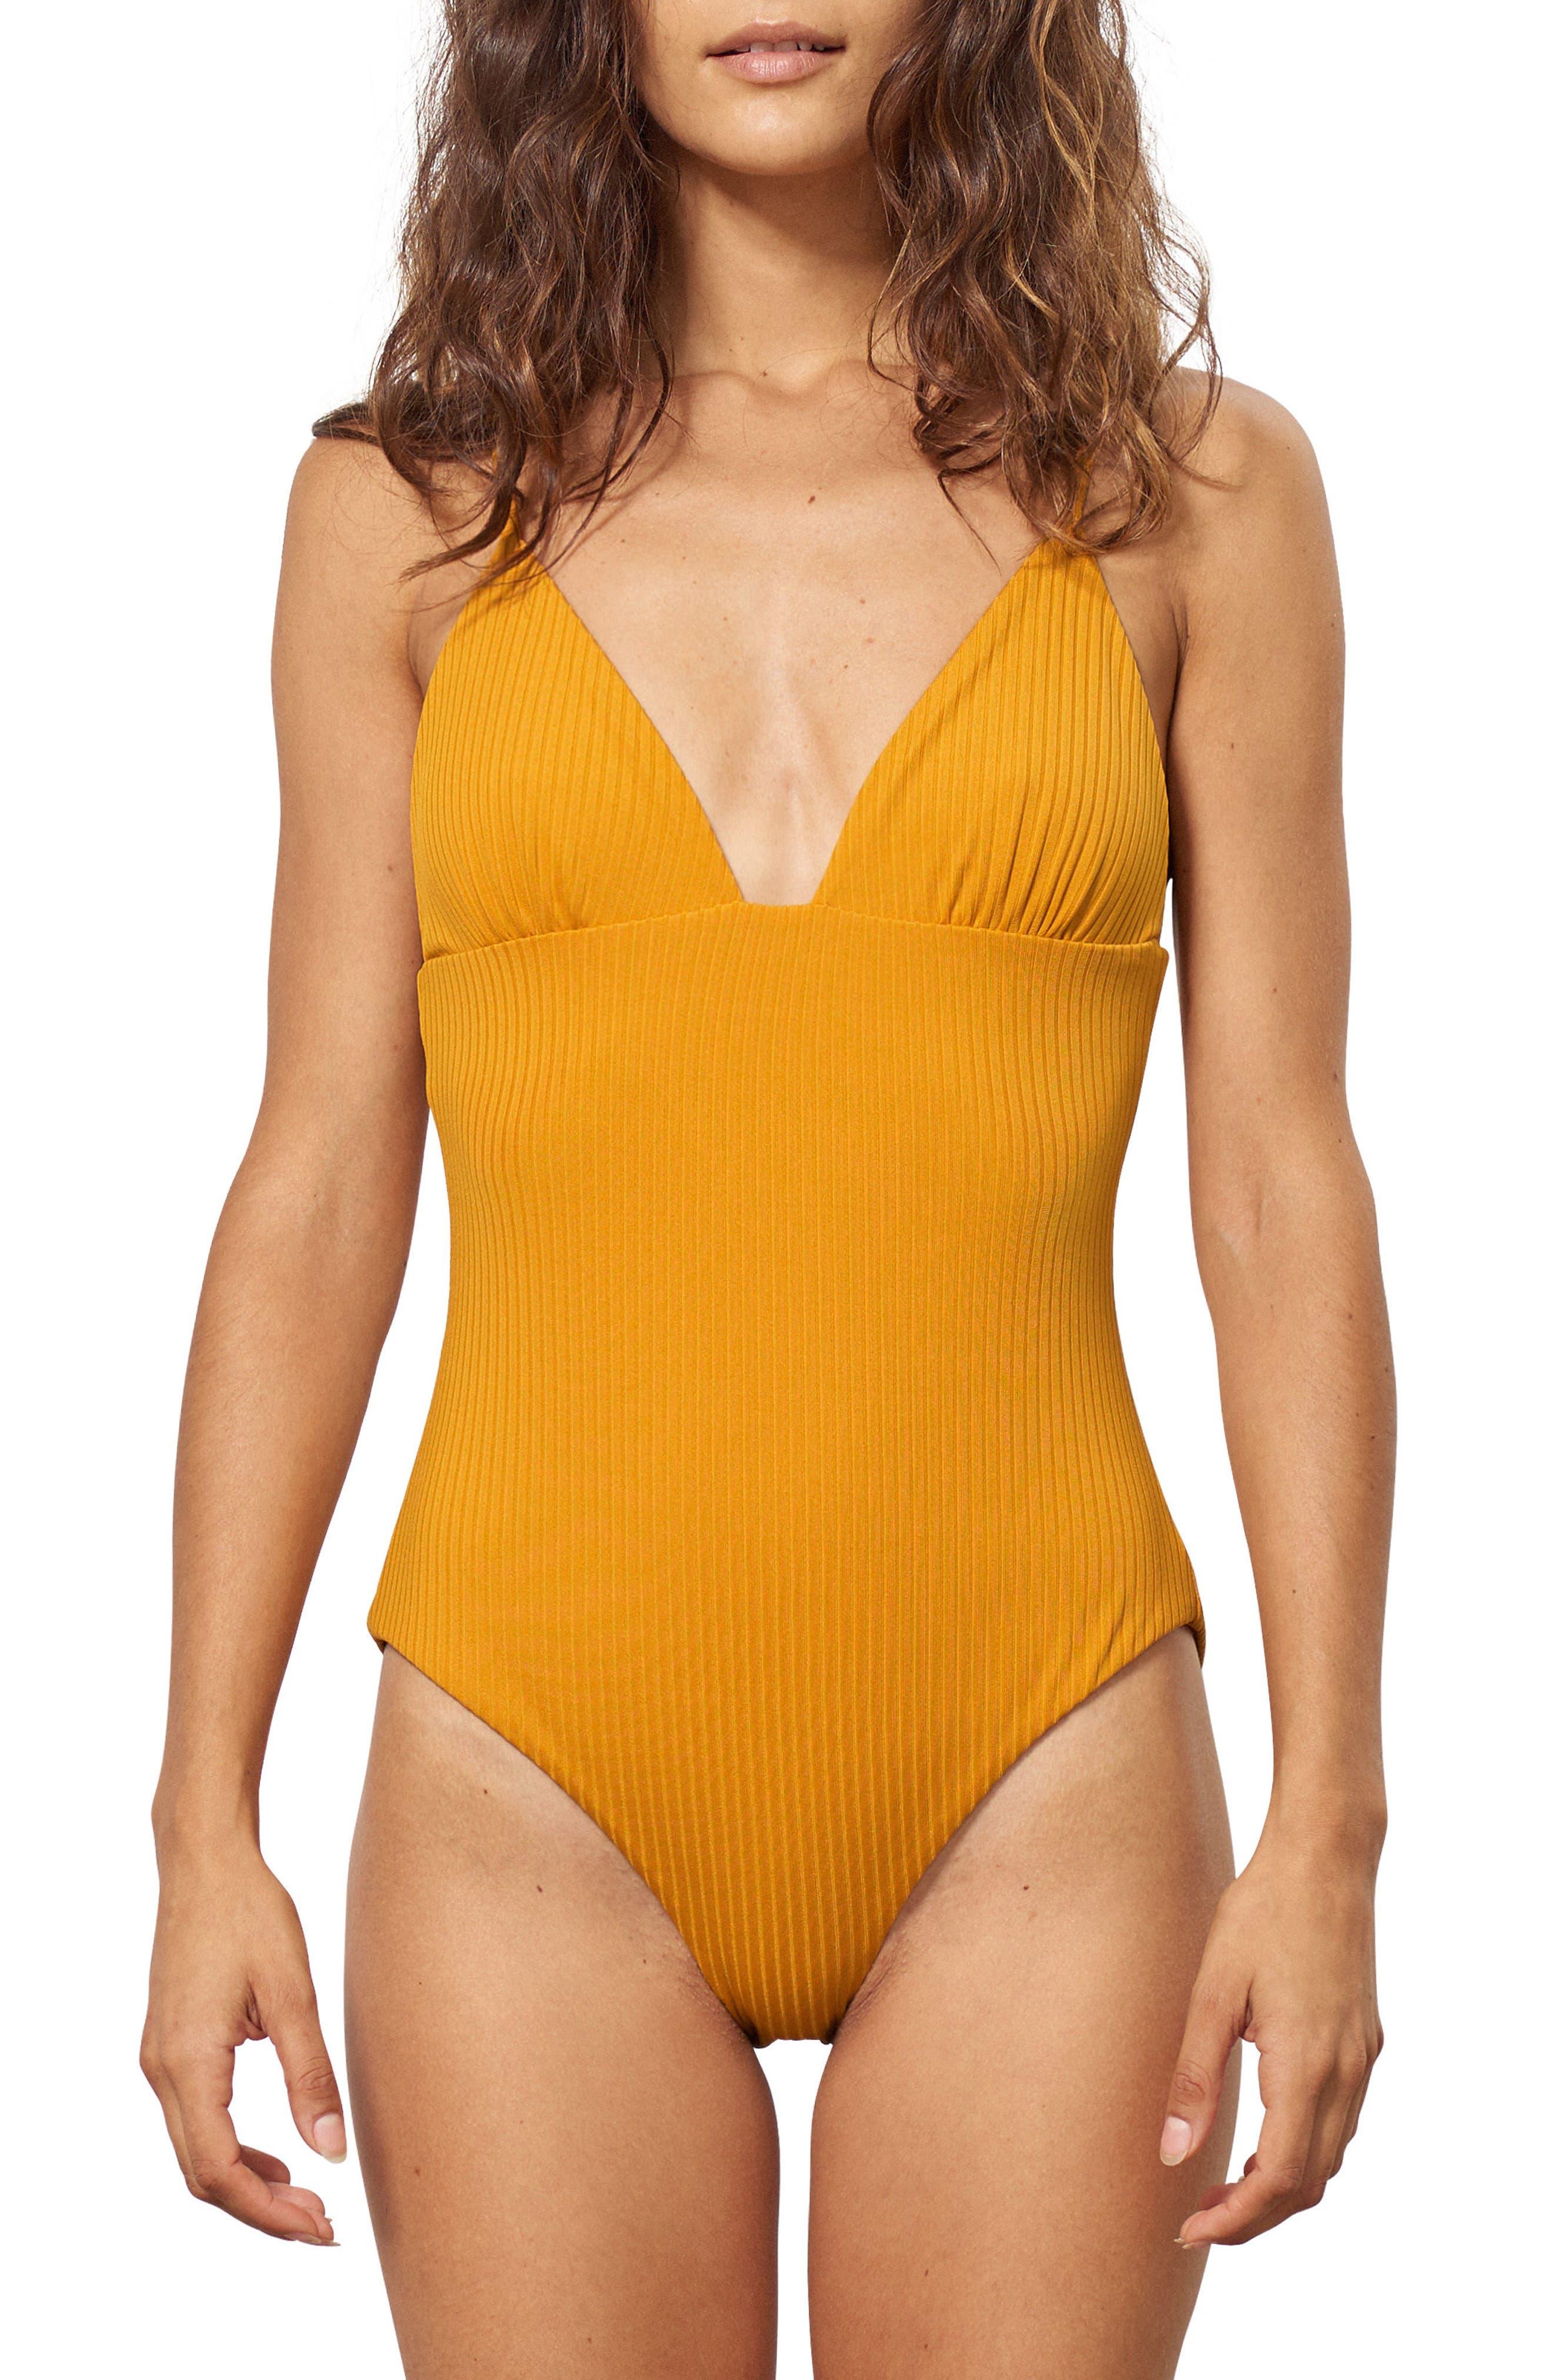 MARA HOFFMAN Virginia One-Piece Swimsuit, Main, color, 790